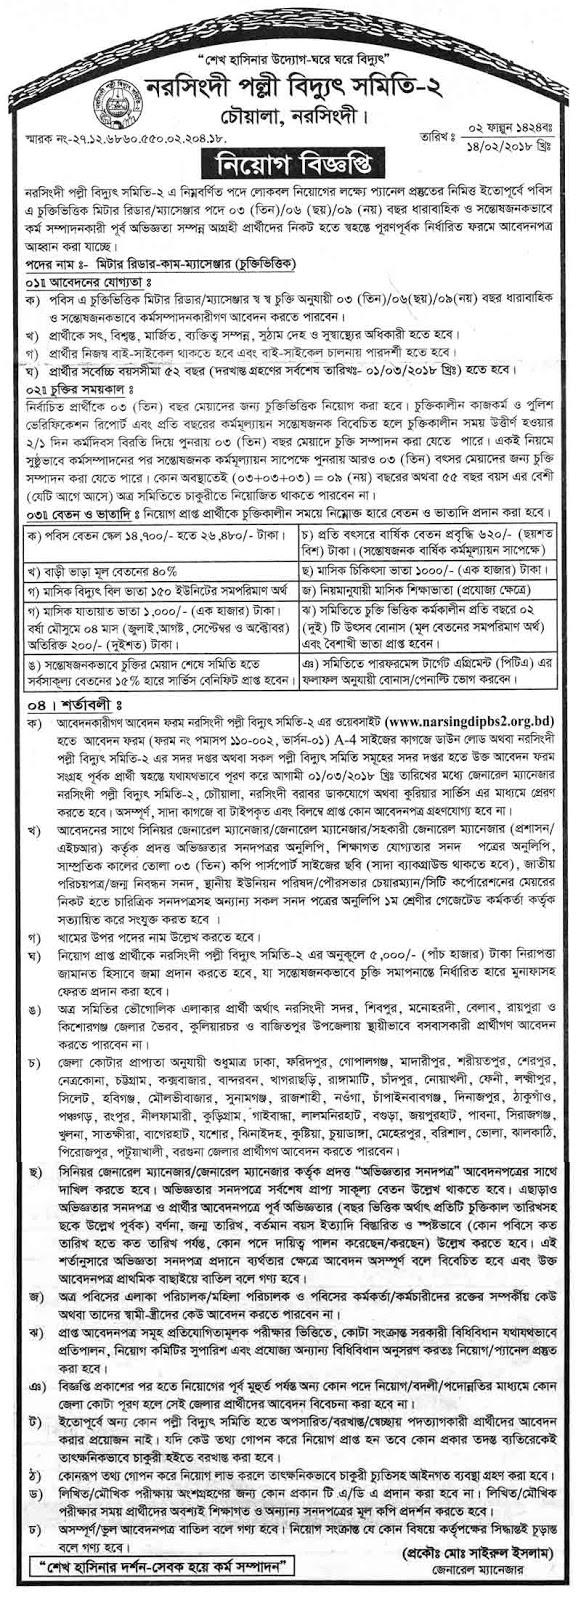 Bangladesh Rural Electrification Board BREB Job Circular 2018 2